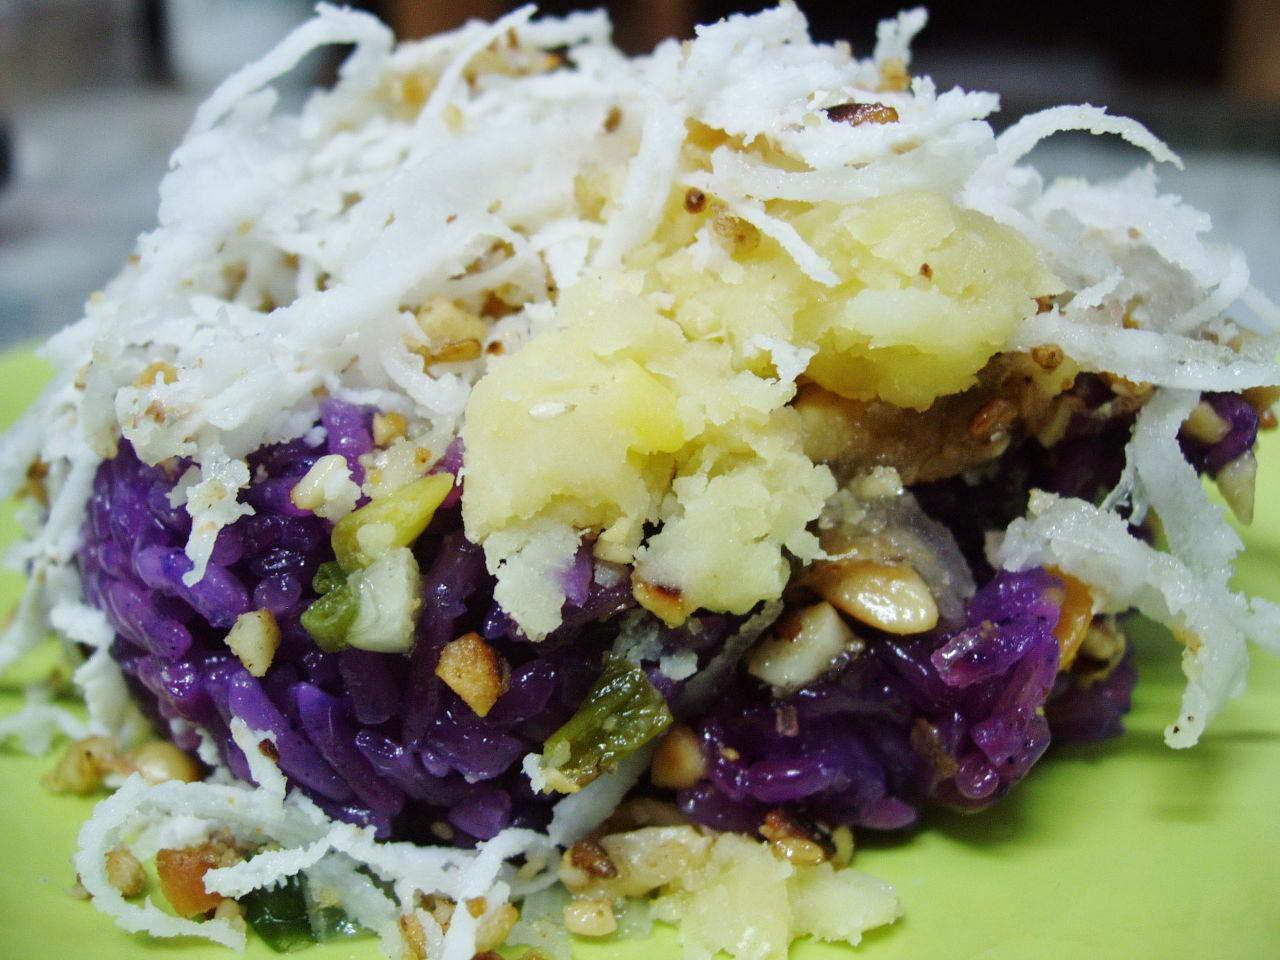 (Xôi Lá Cẩm) - Steamed Sticky Rice with Cẩm Leaves